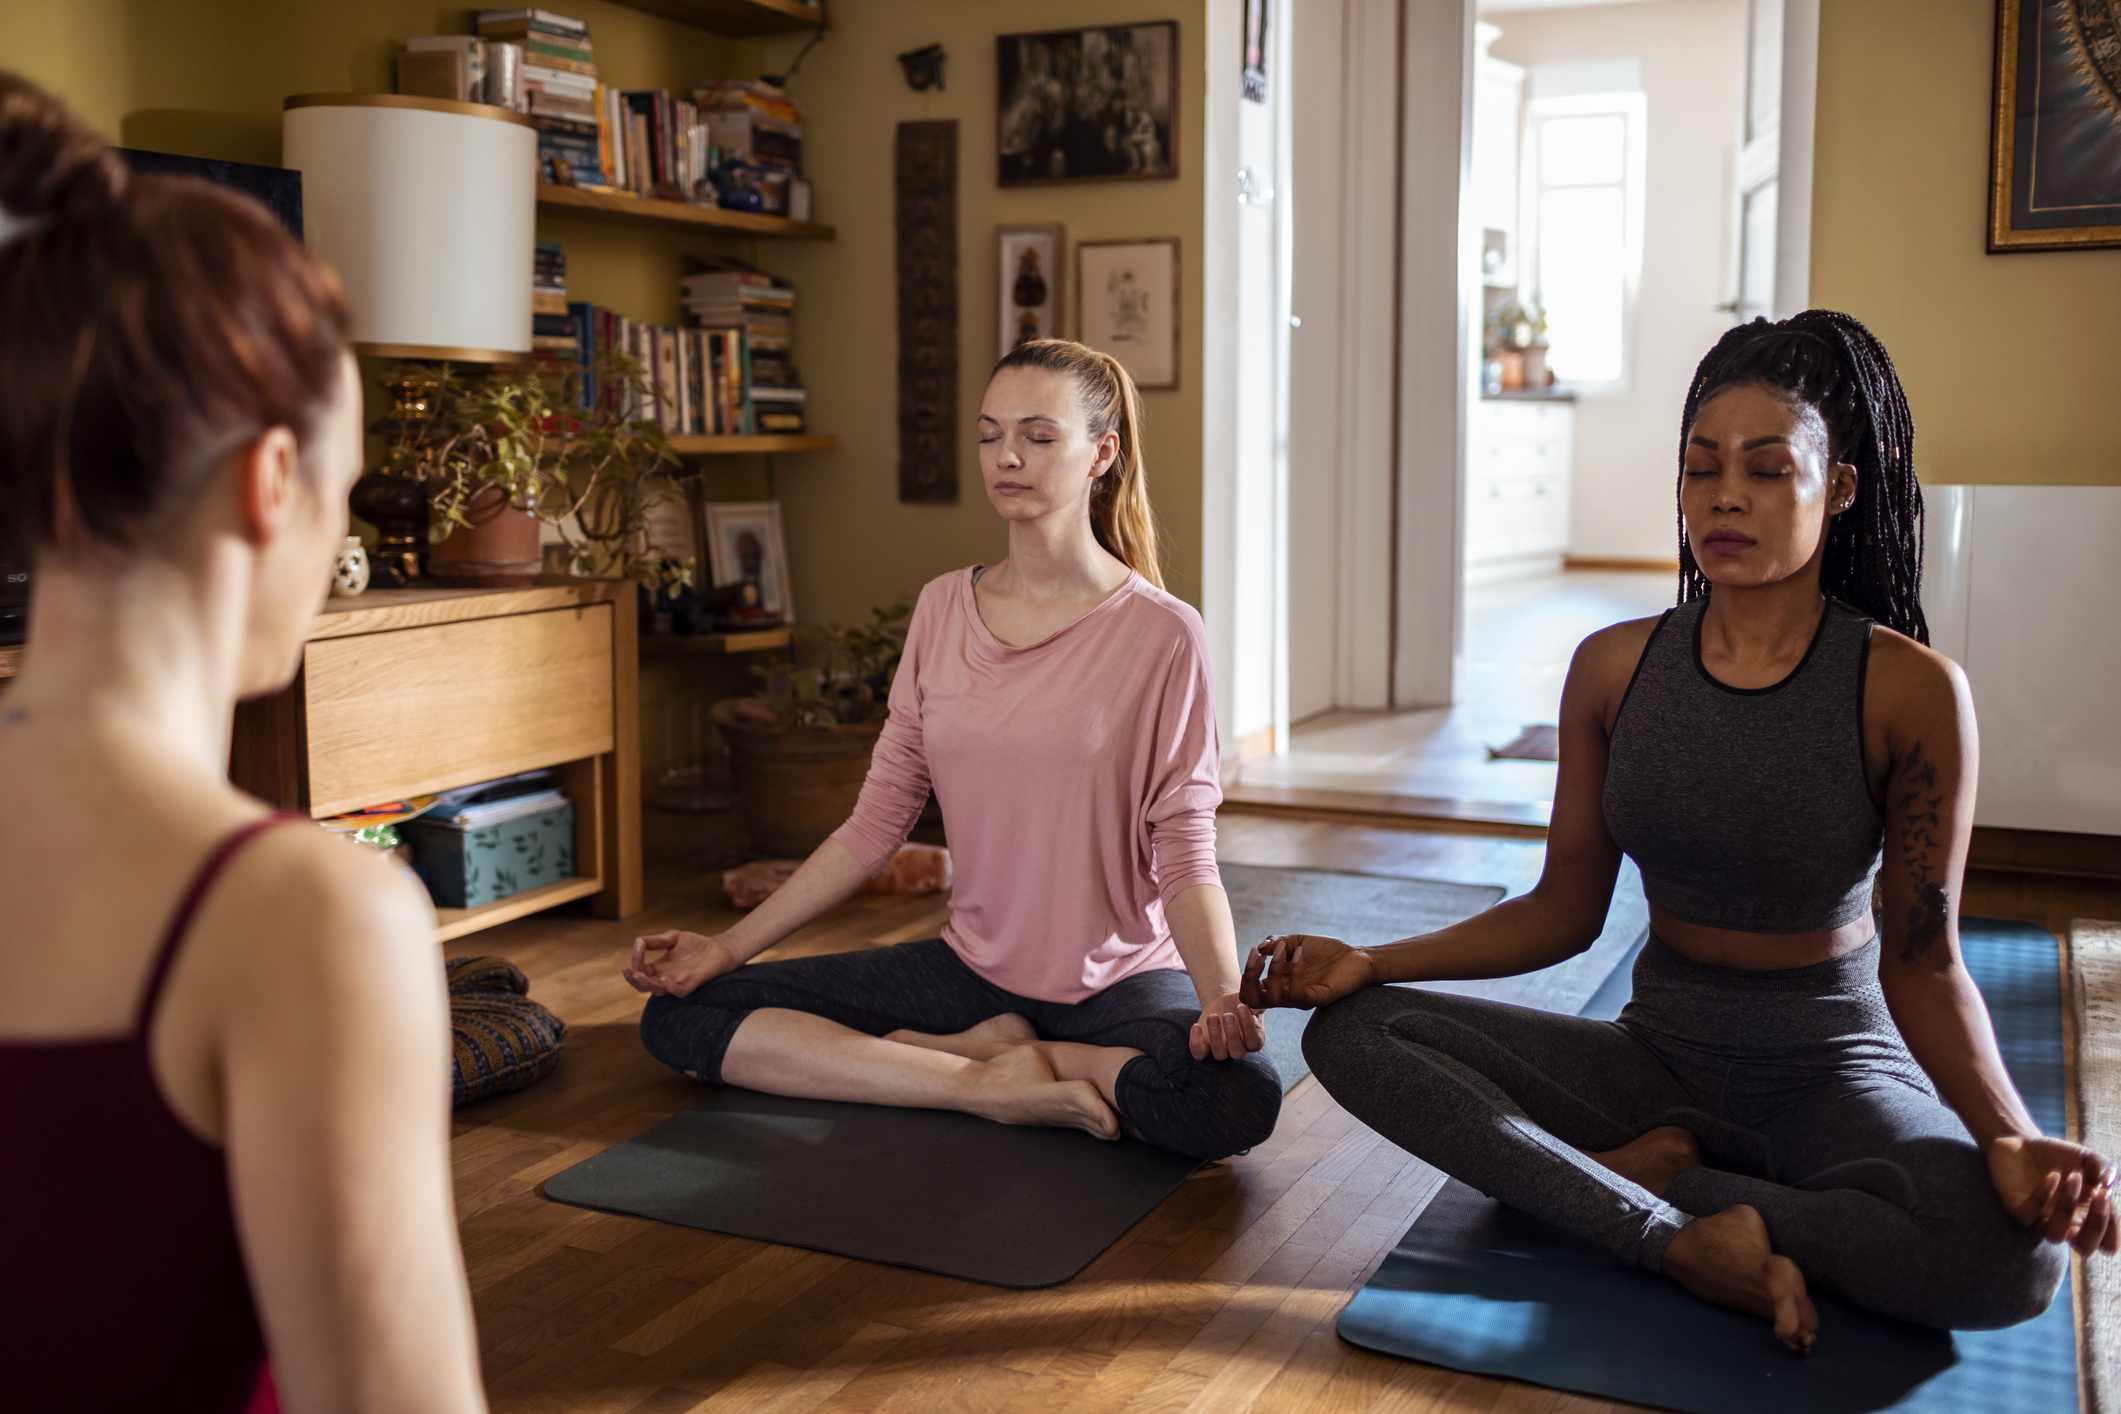 Trio of friends meditating